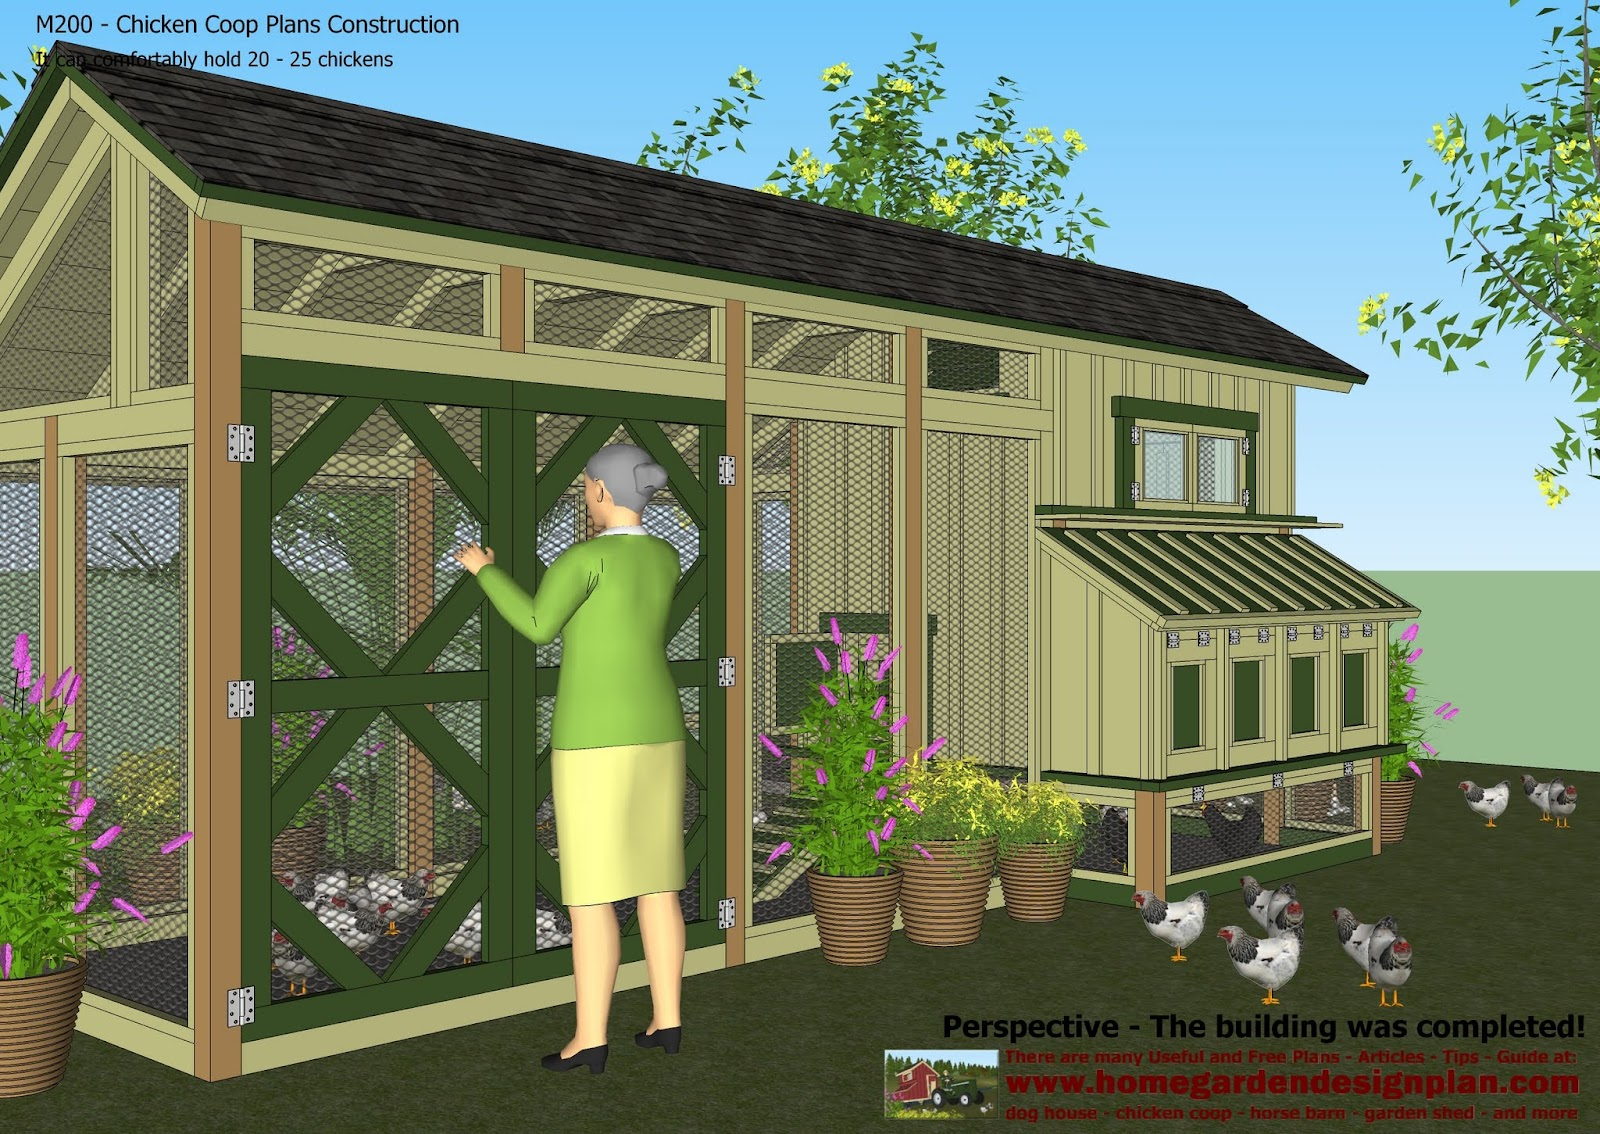 Home garden plans m200 chicken coop plans construction for Chicken house designs free